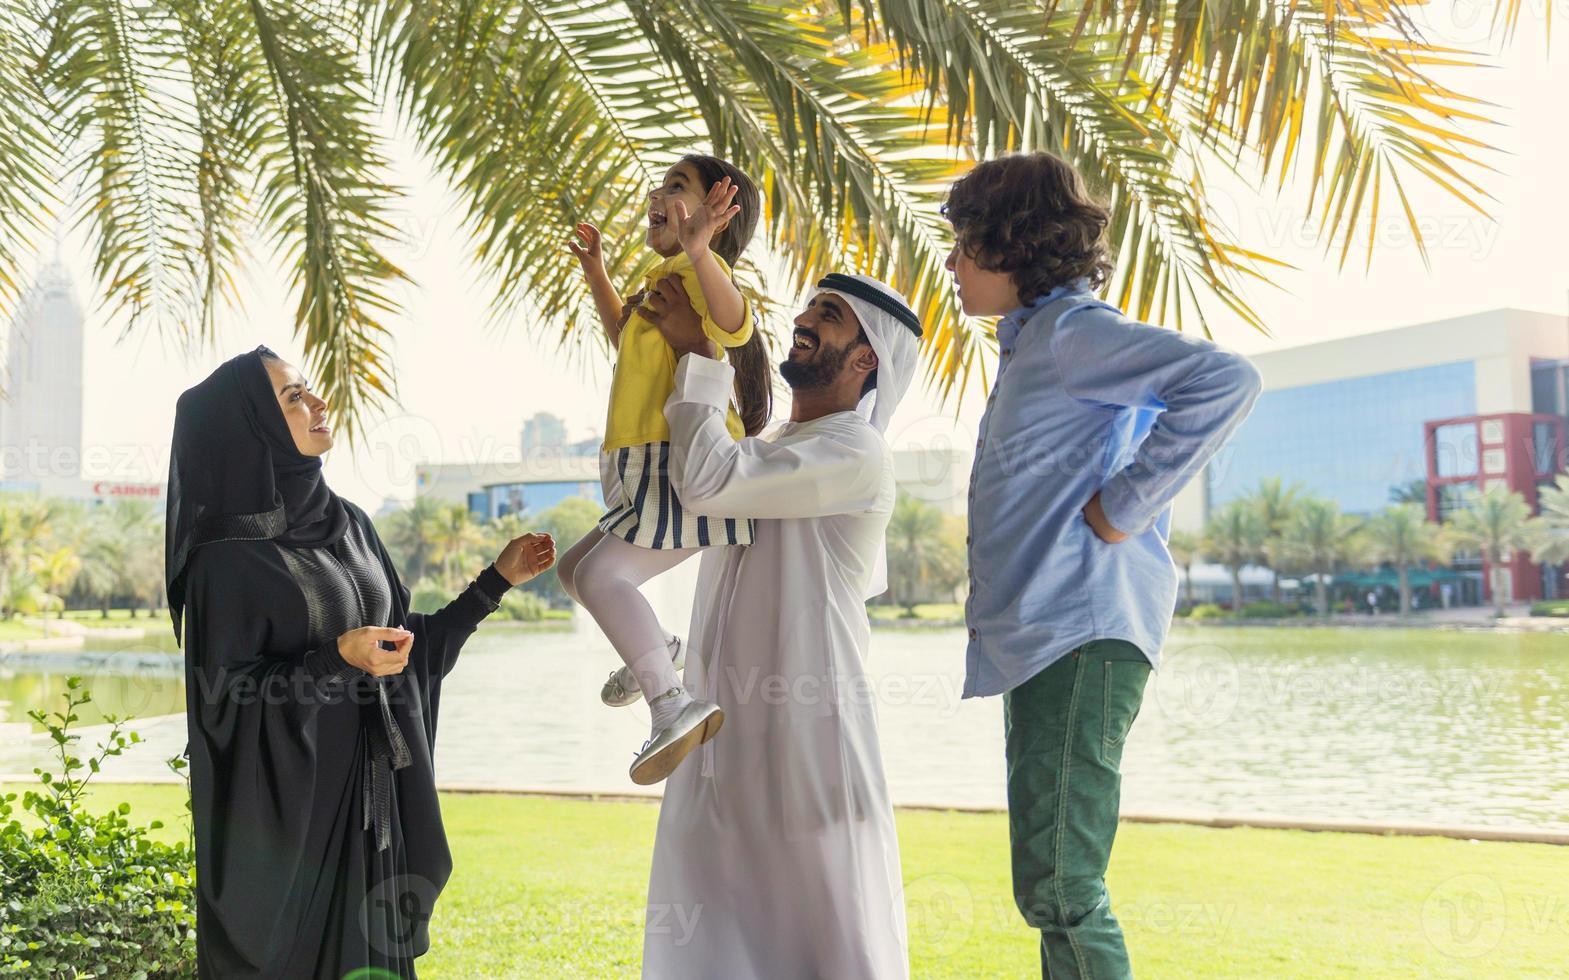 emirati-familjen fotograferad i en park foto